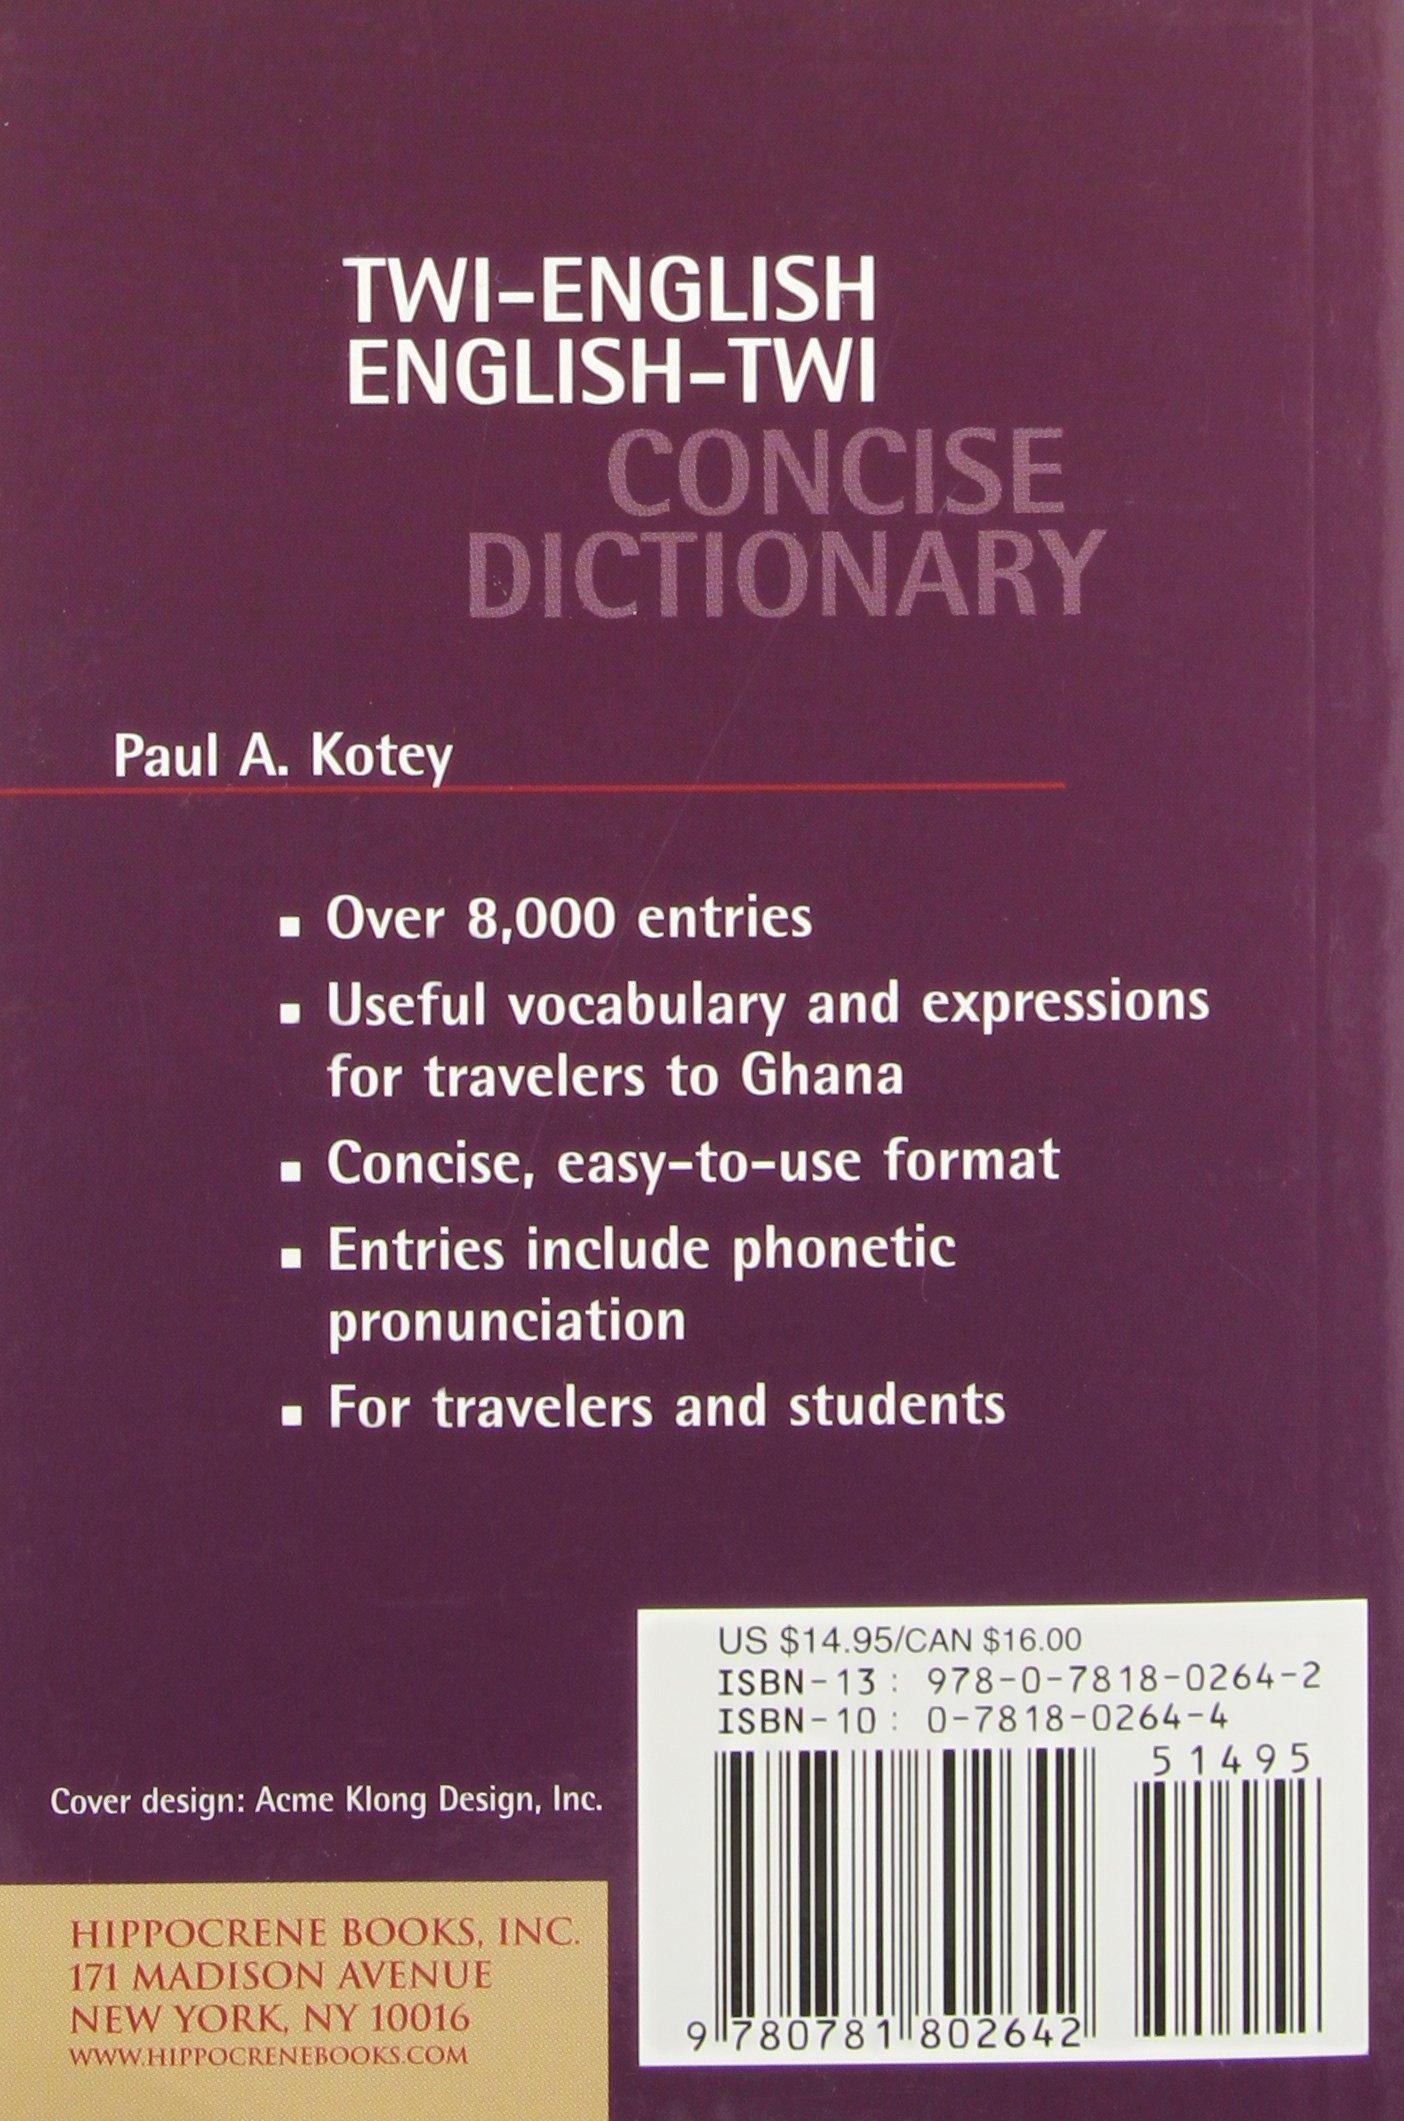 Twi-English/English-Twi Concise Dictionary (Hippocrene Concise